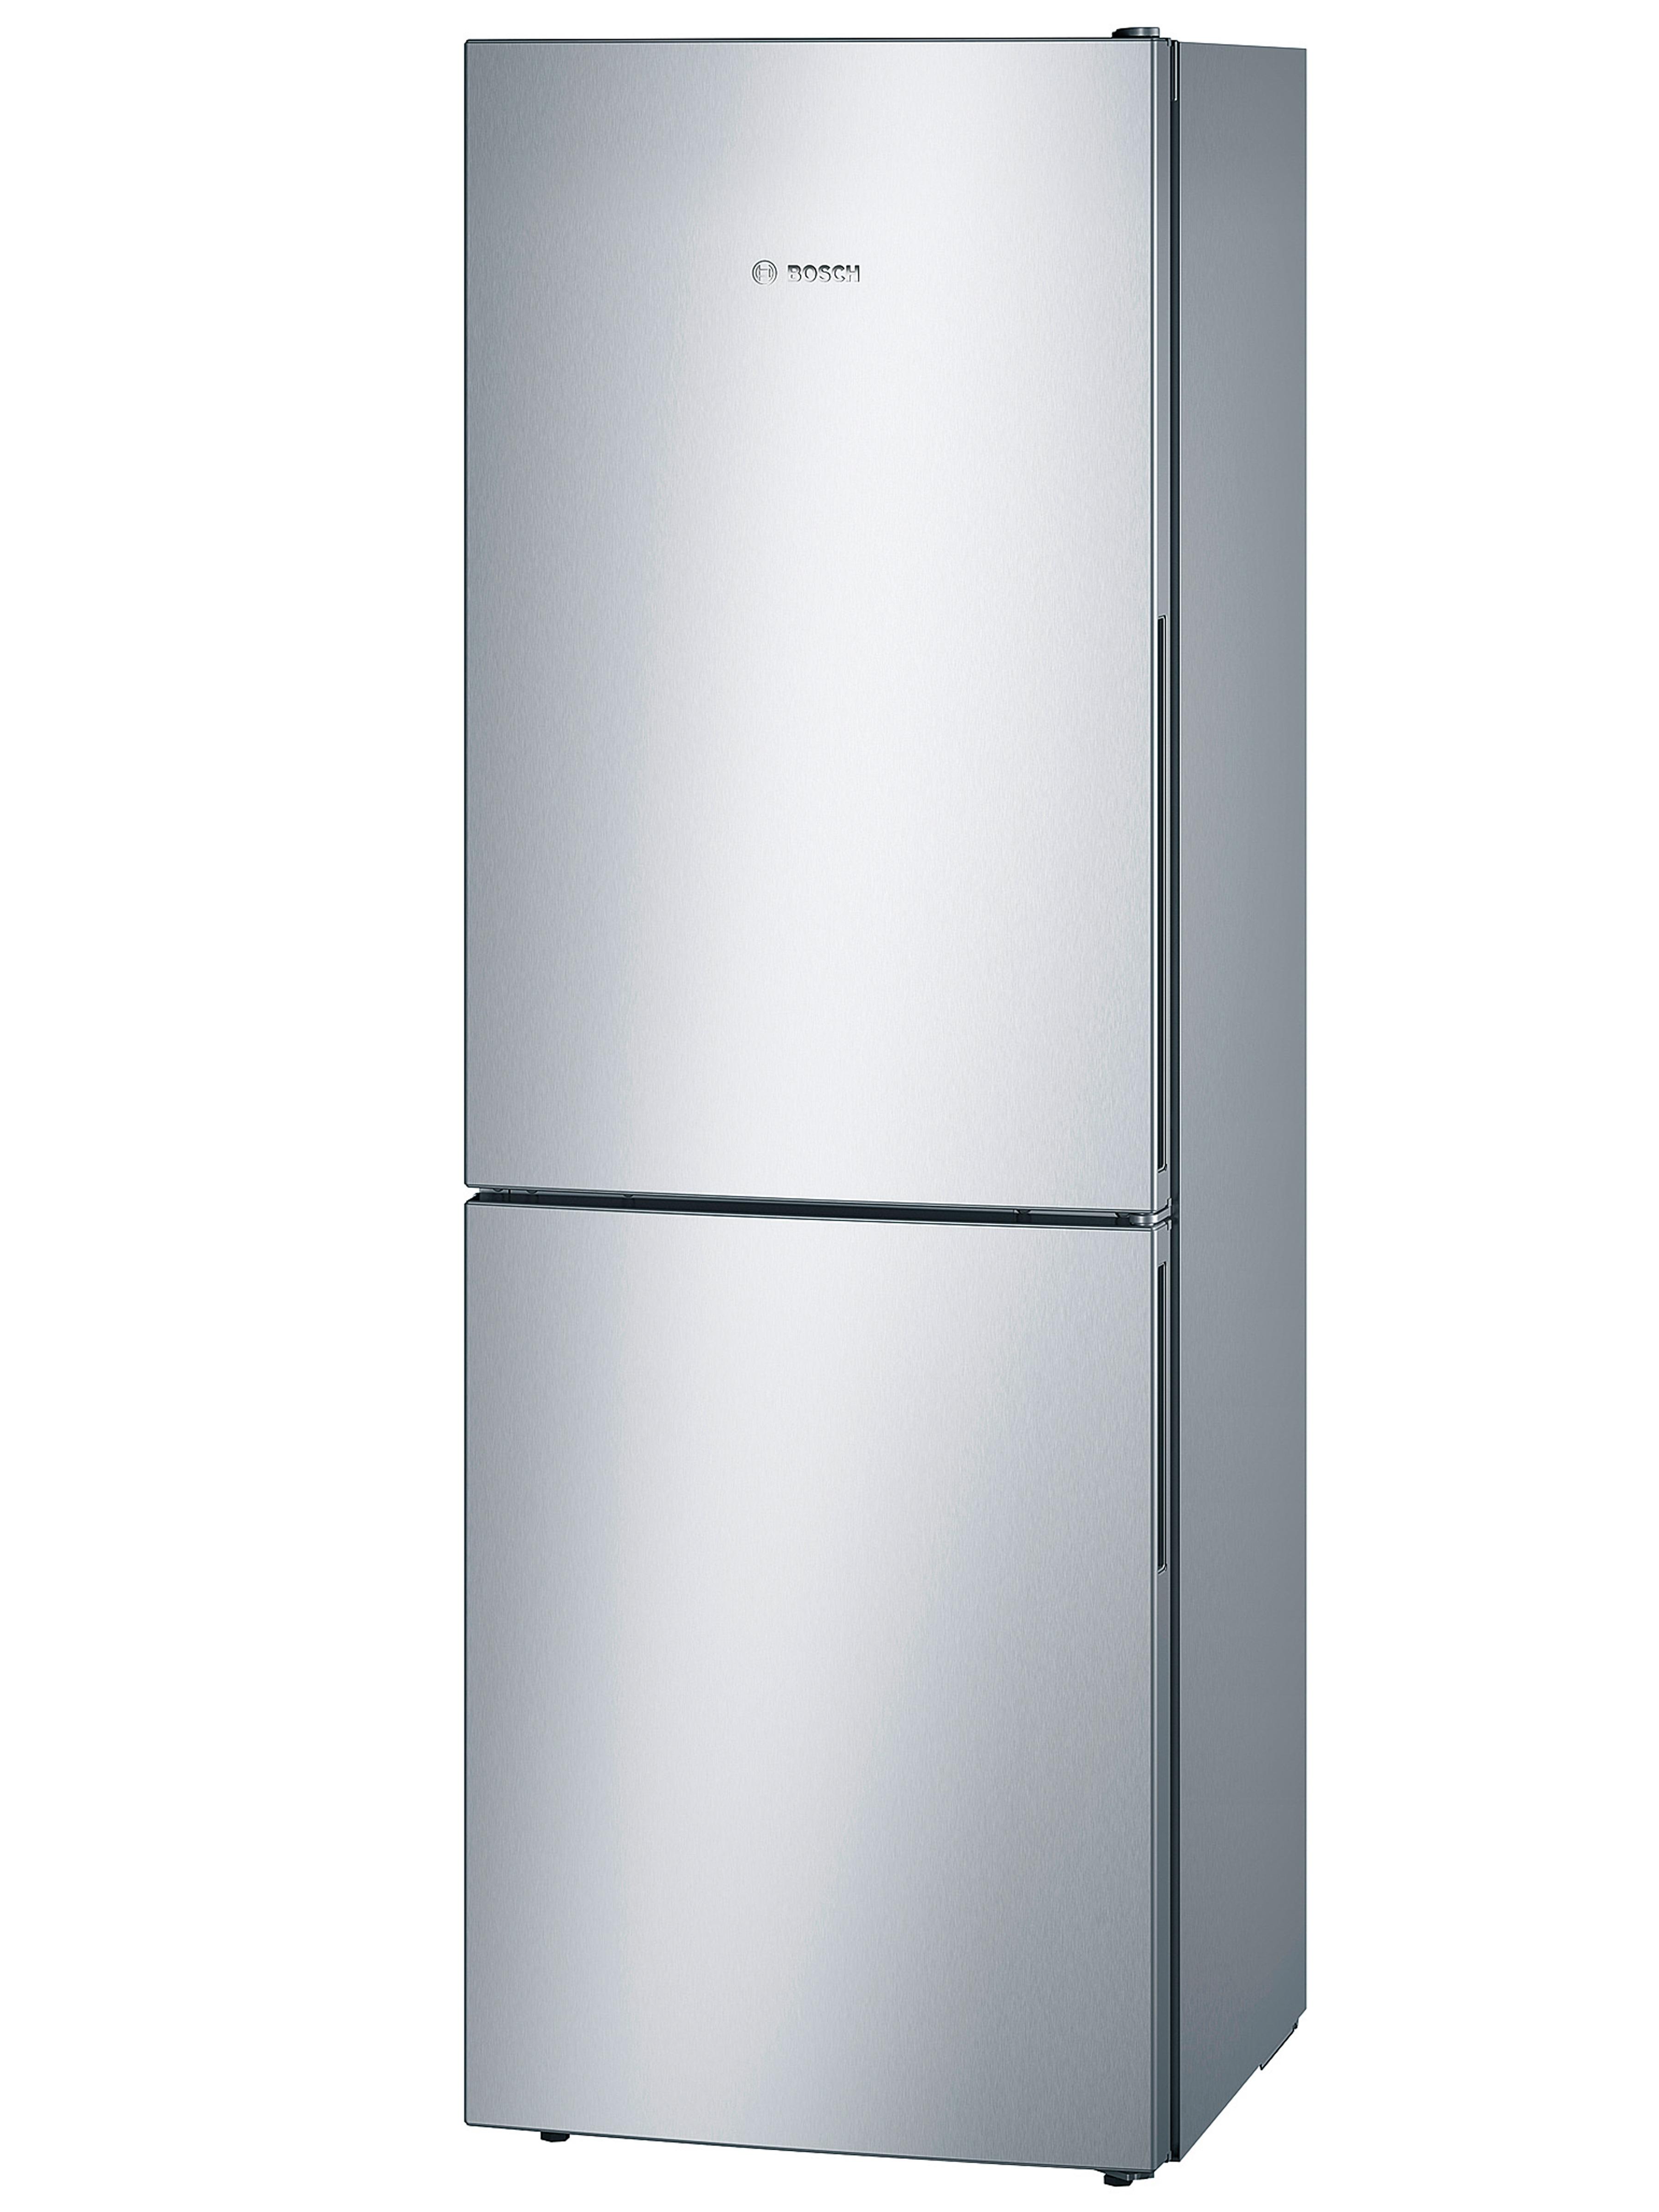 Bosch koelkast met vriesvak KGV33VI31